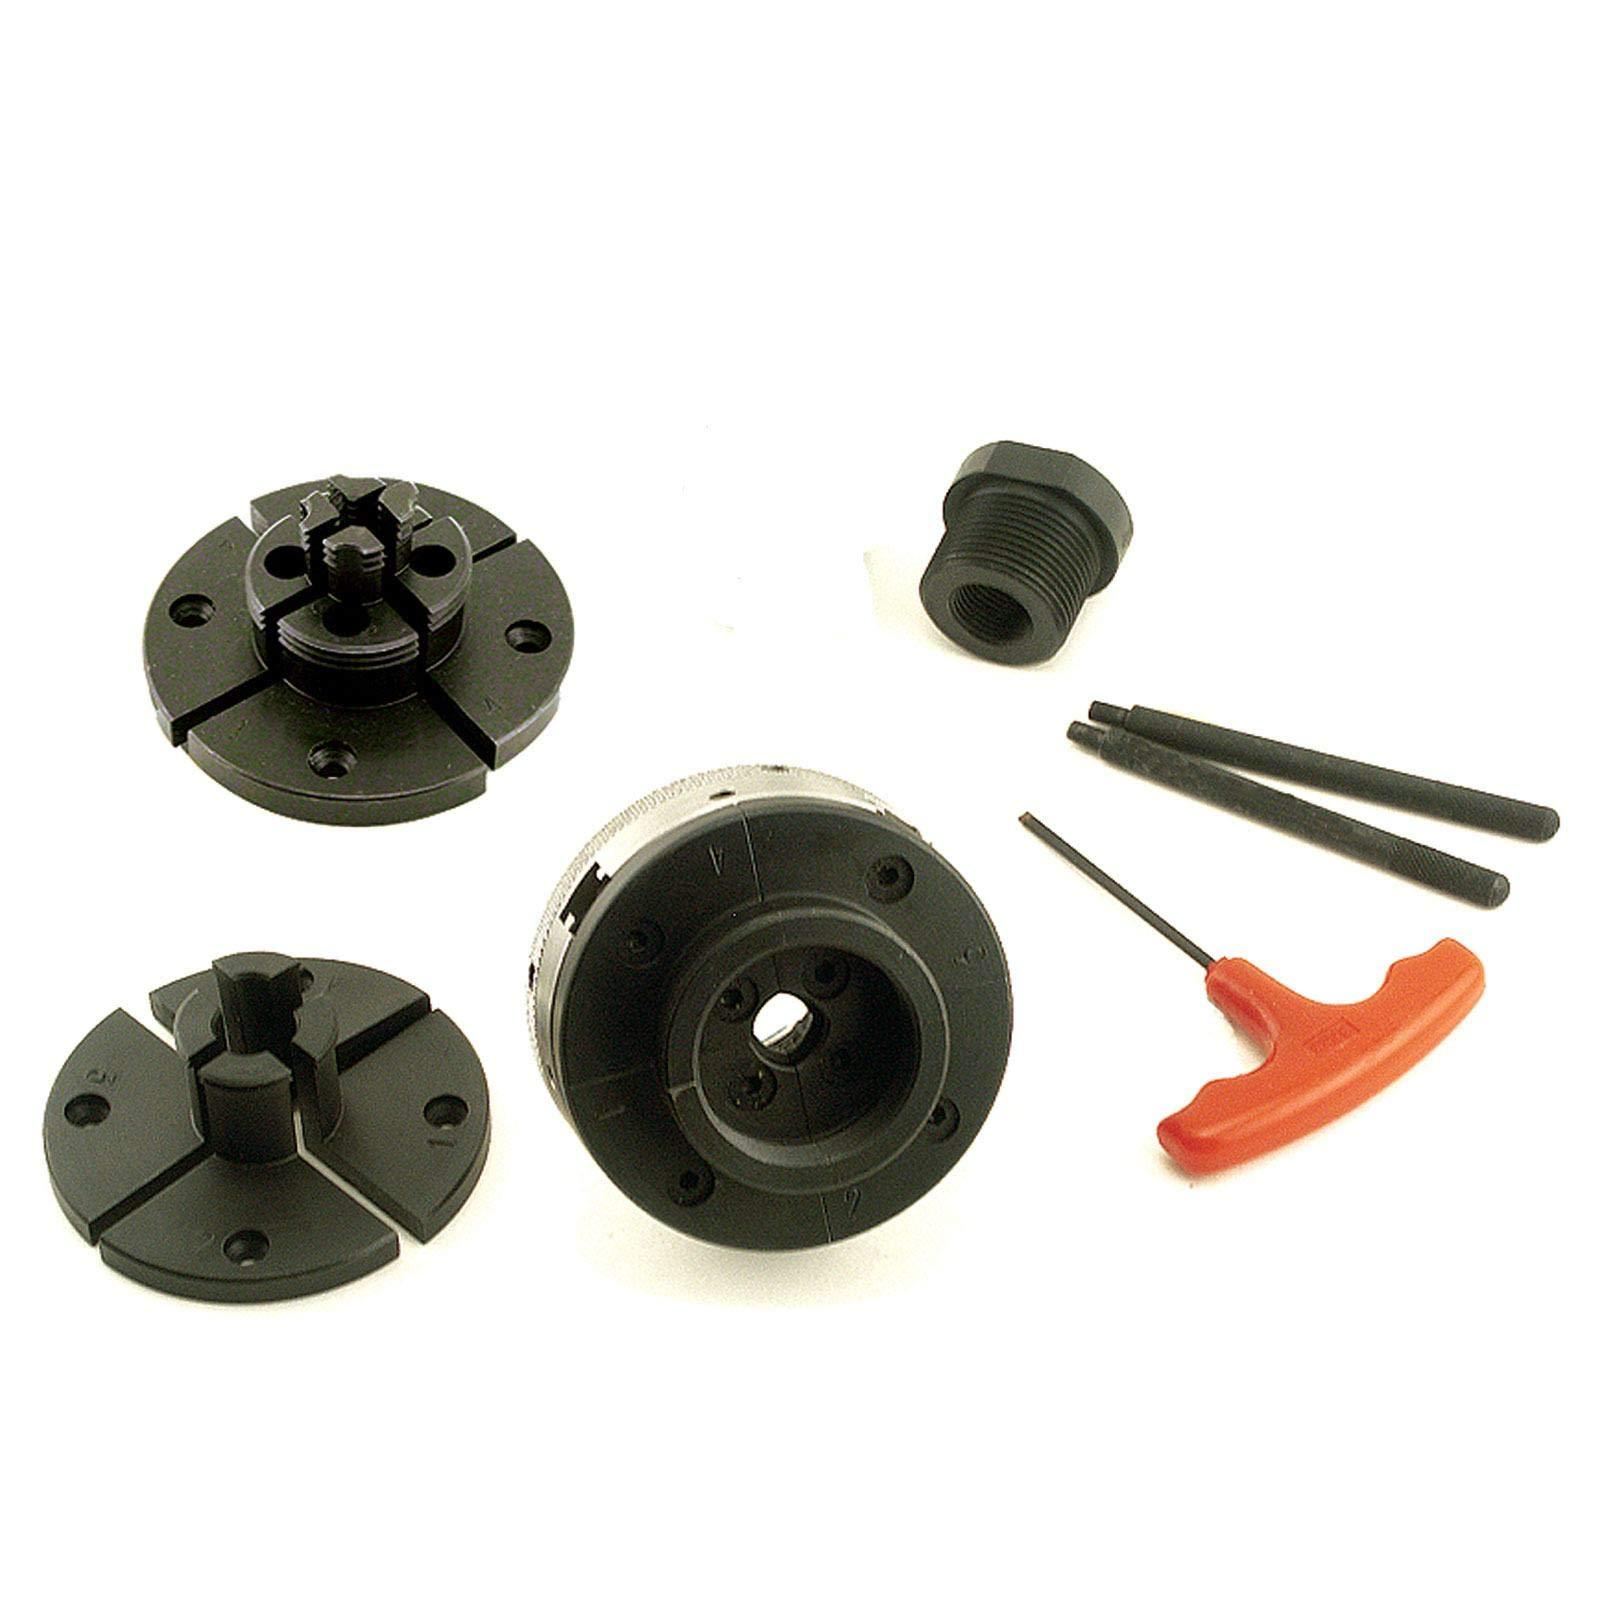 PSI CMG3C Mini Grip 4 Jaw Wood Lathe Chuck System